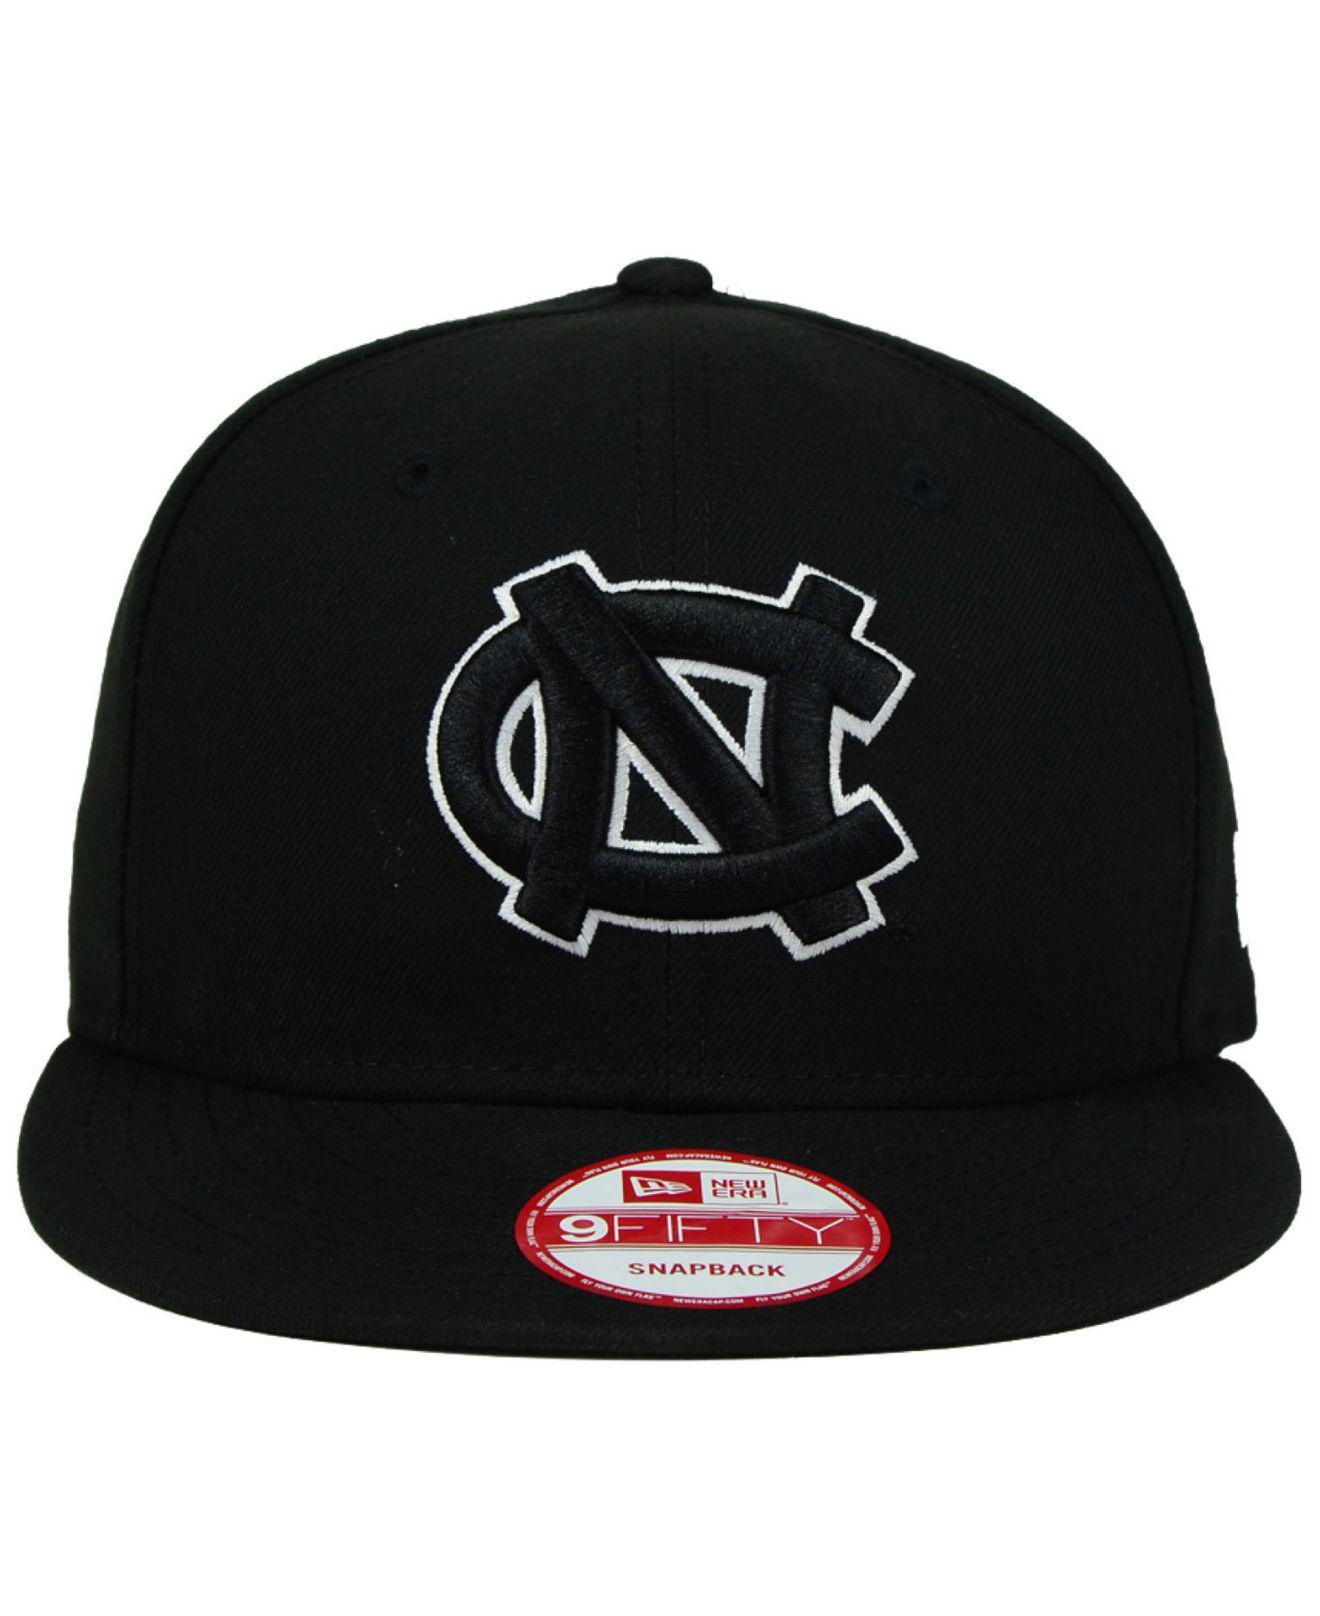 Lyst - KTZ North Carolina Tar Heels Black White 9fifty Snapback Cap in Black  for Men 7dbb92c3e